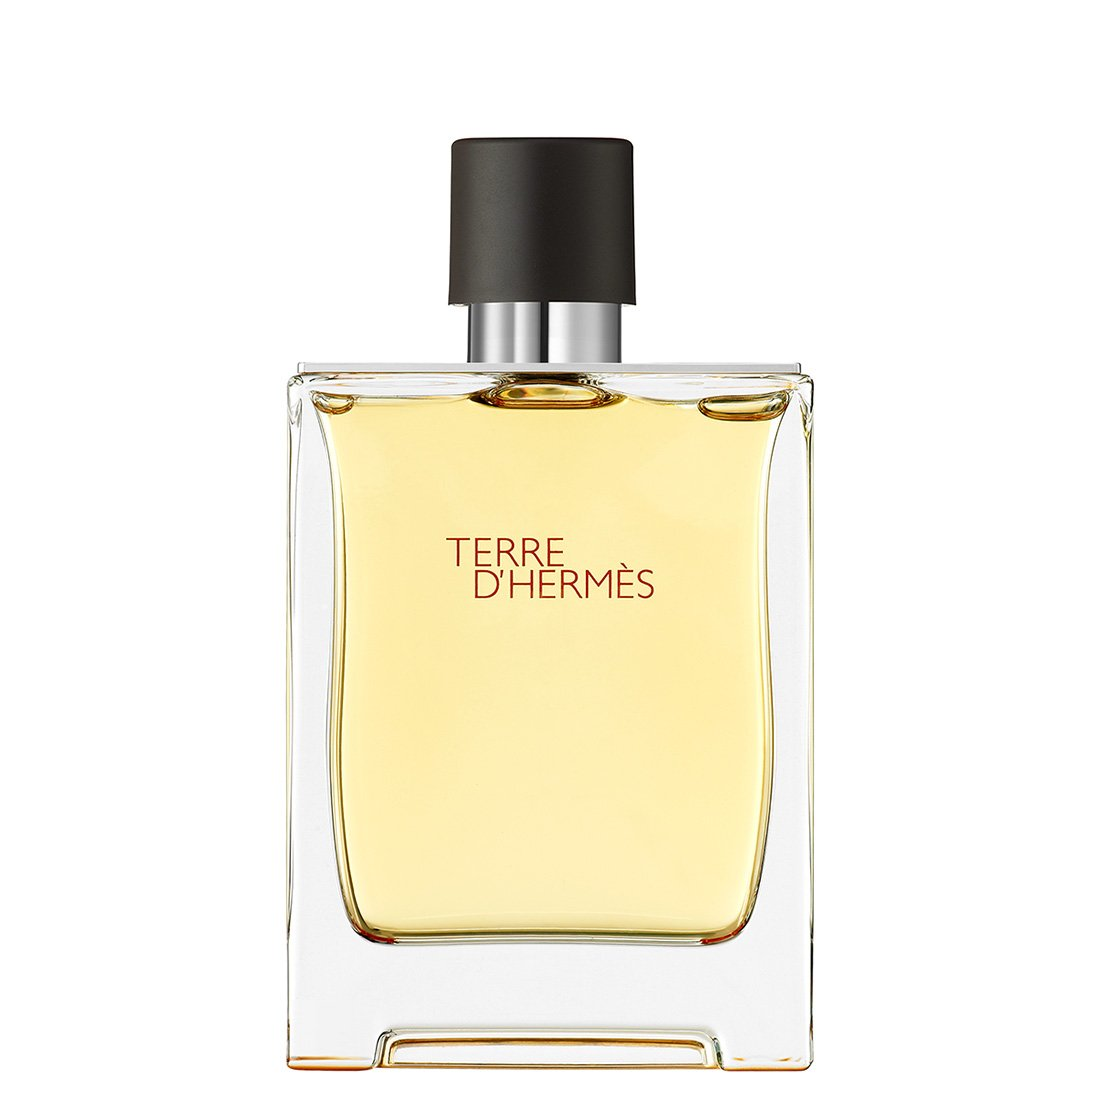 Hermès - Terre d'Hermès - Parfum